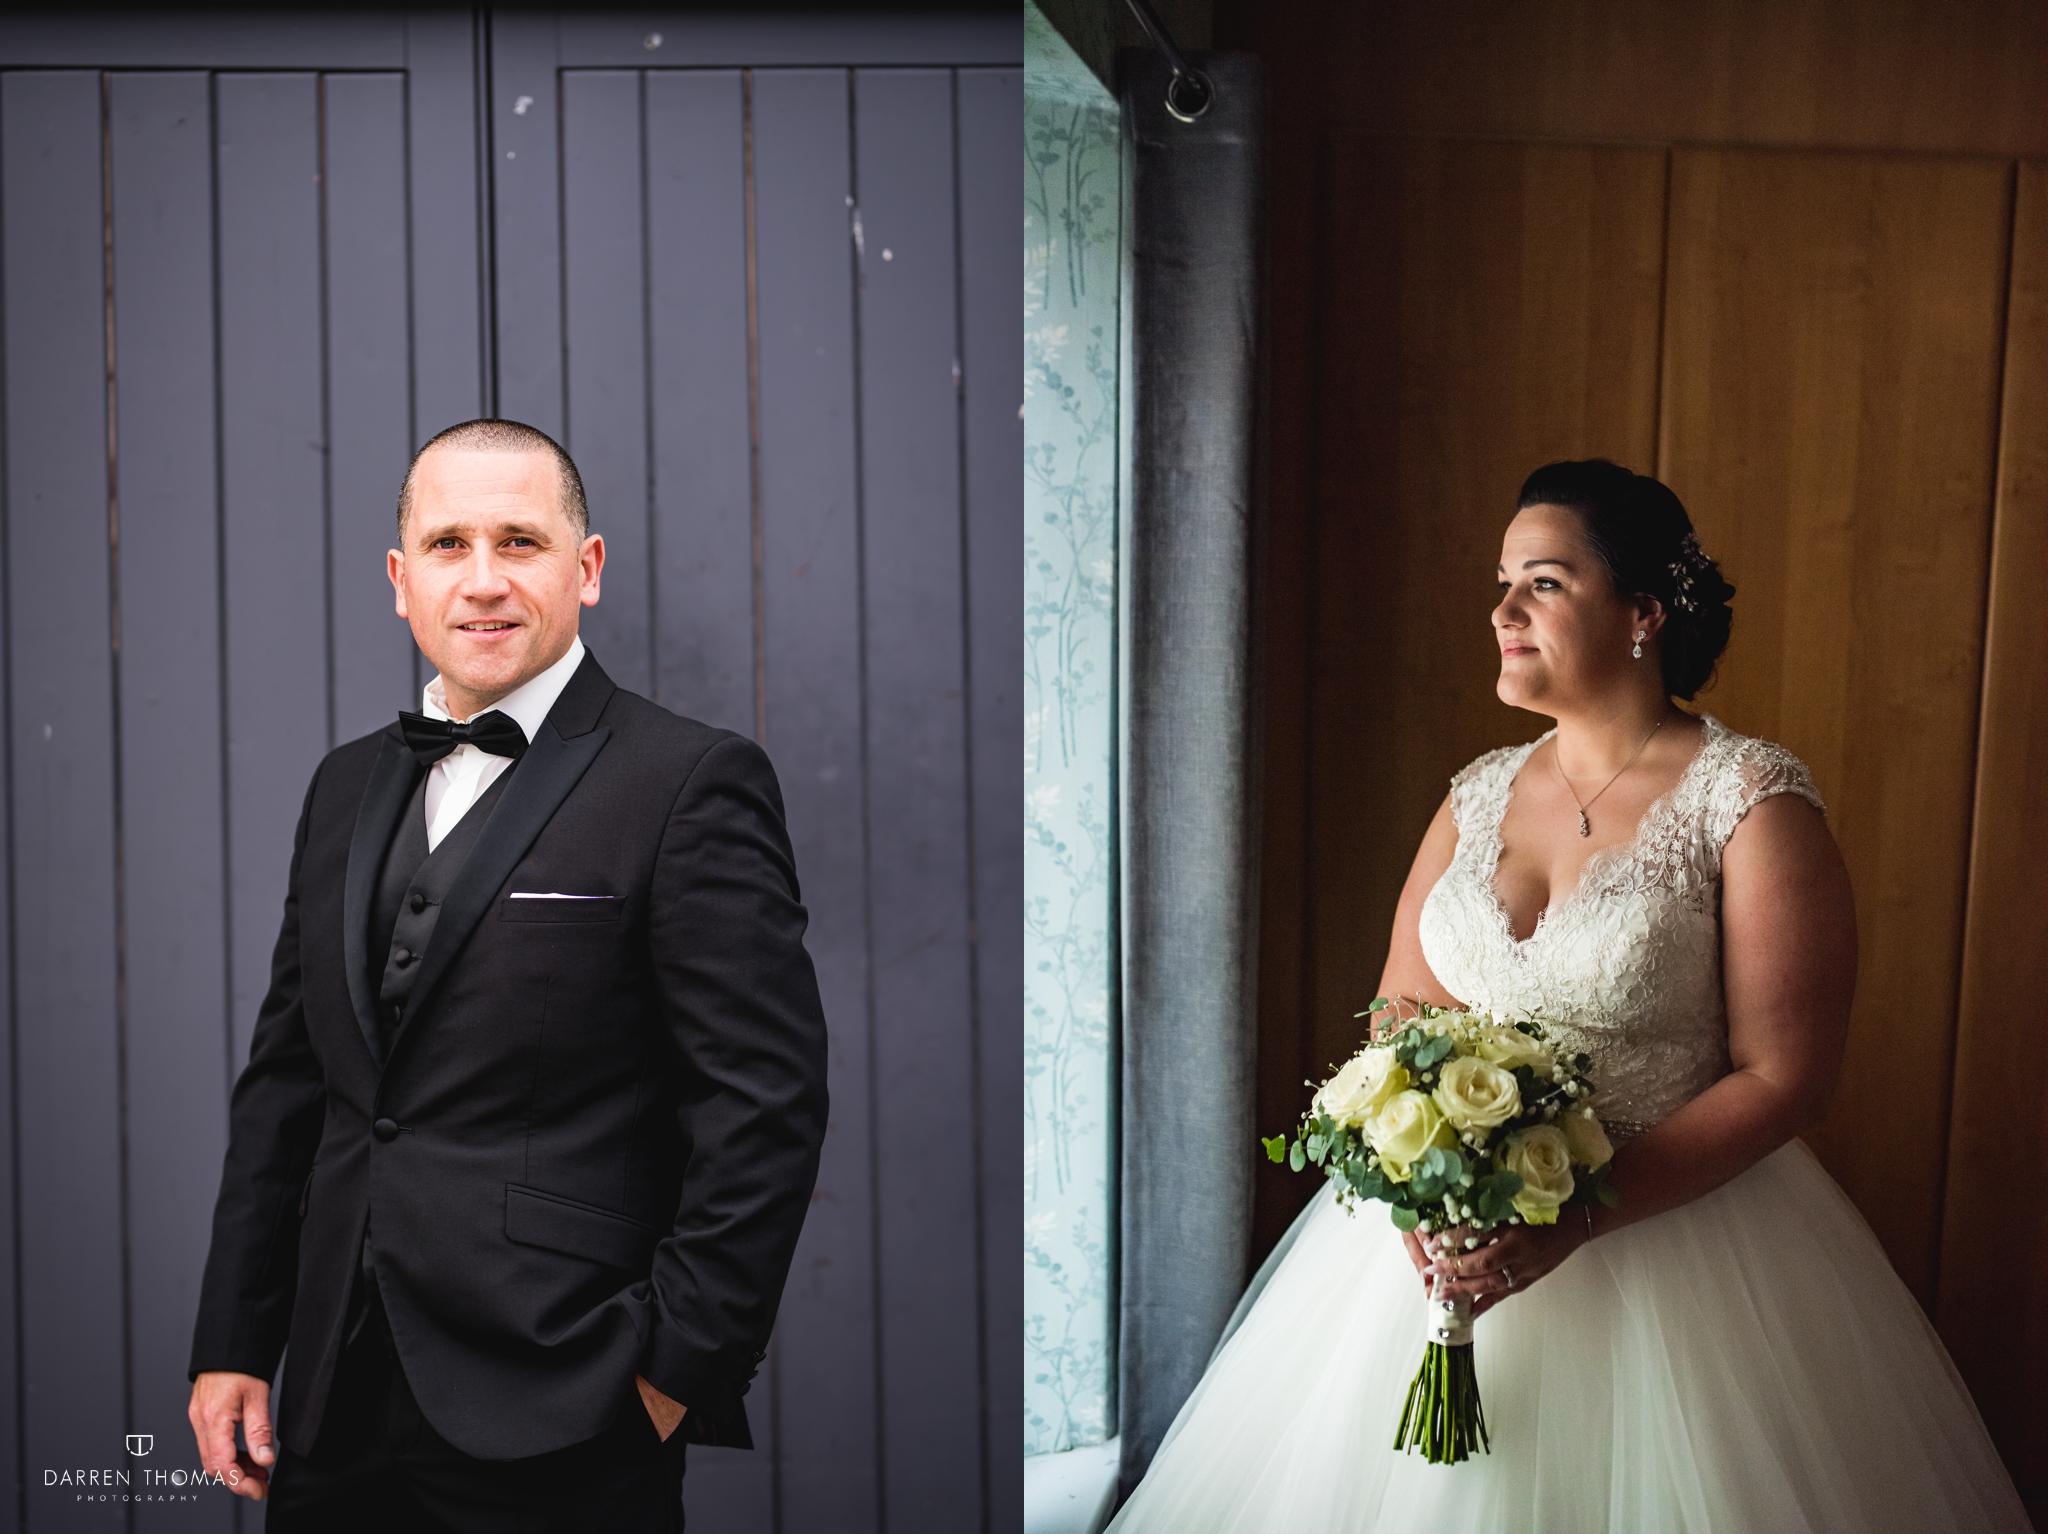 Llechwen-hall-wedding-photography6.jpg